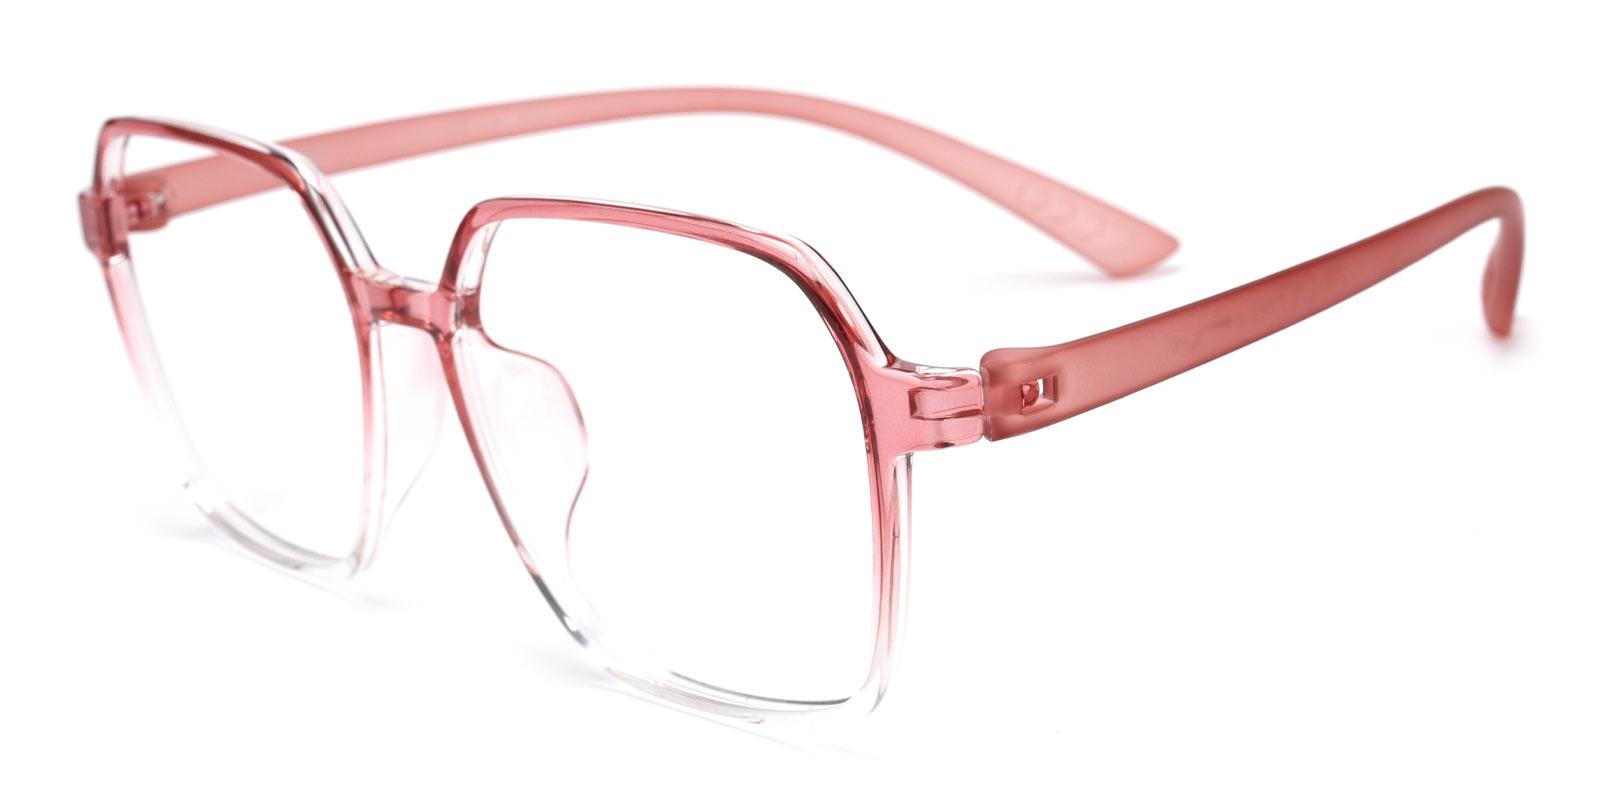 Macaron-Red-Square-TR-Eyeglasses-detail